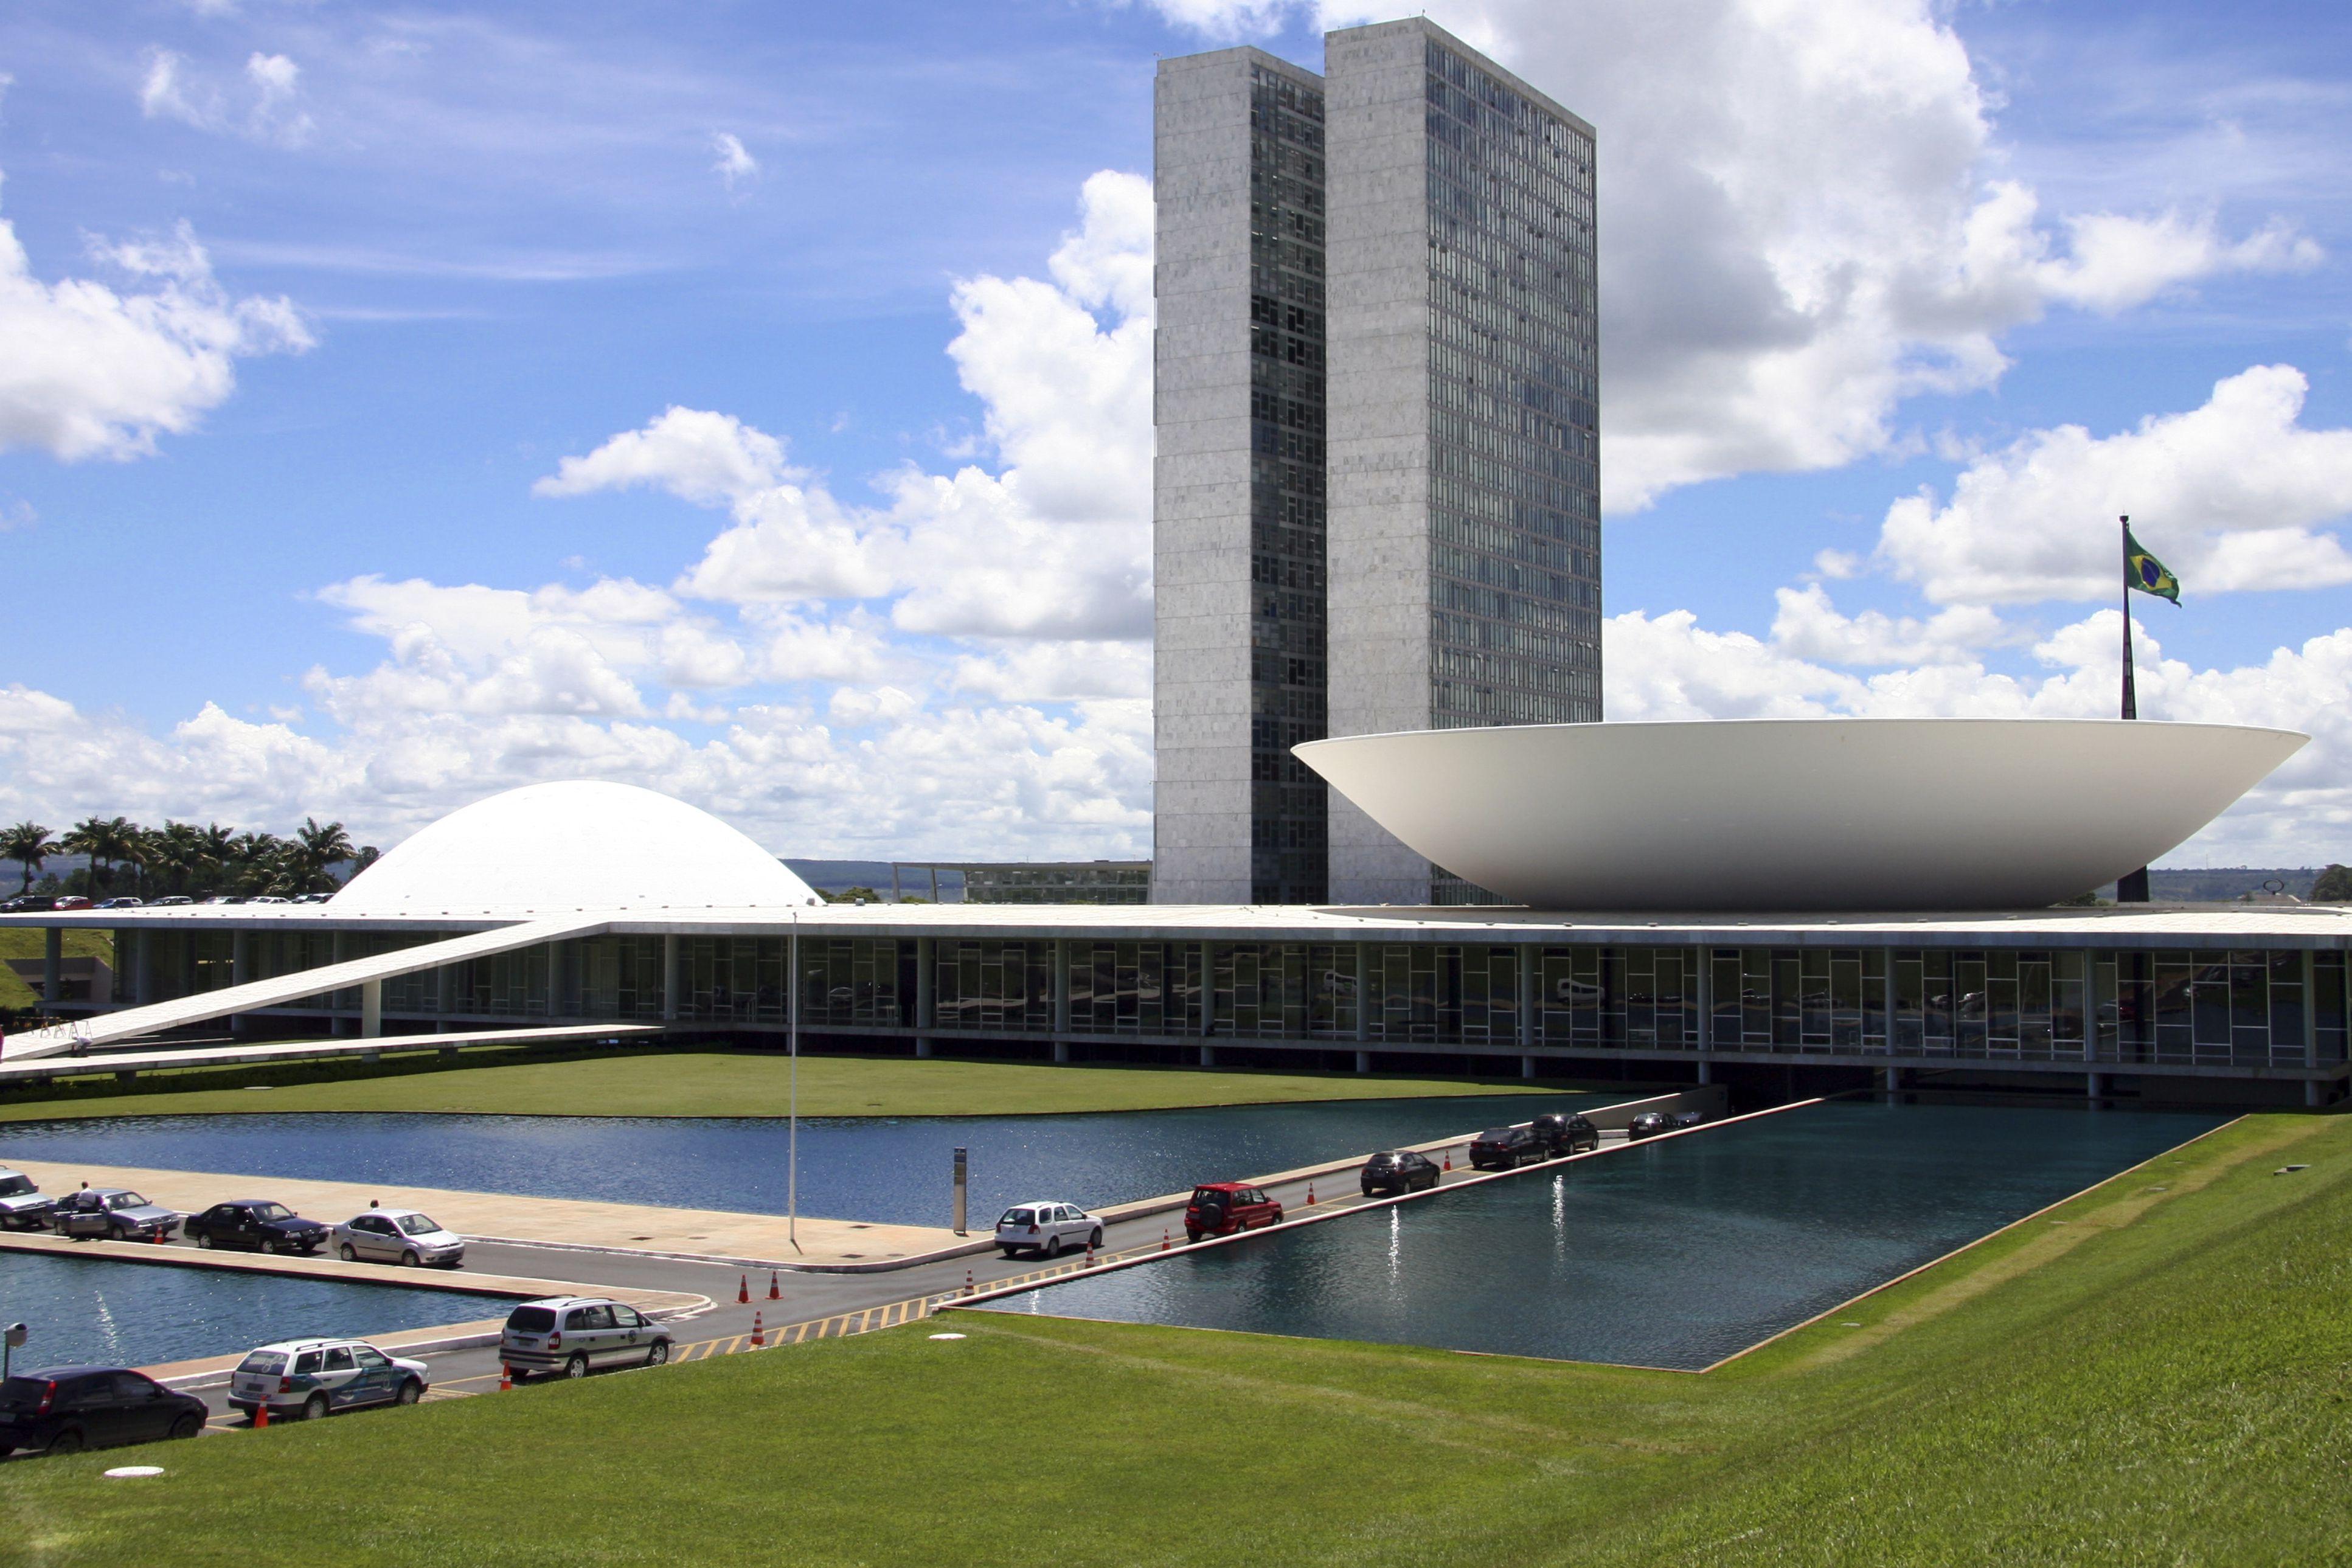 The Brazilian National Congress by Oscar Niemeyer, 2 monoliths between inverted bowls